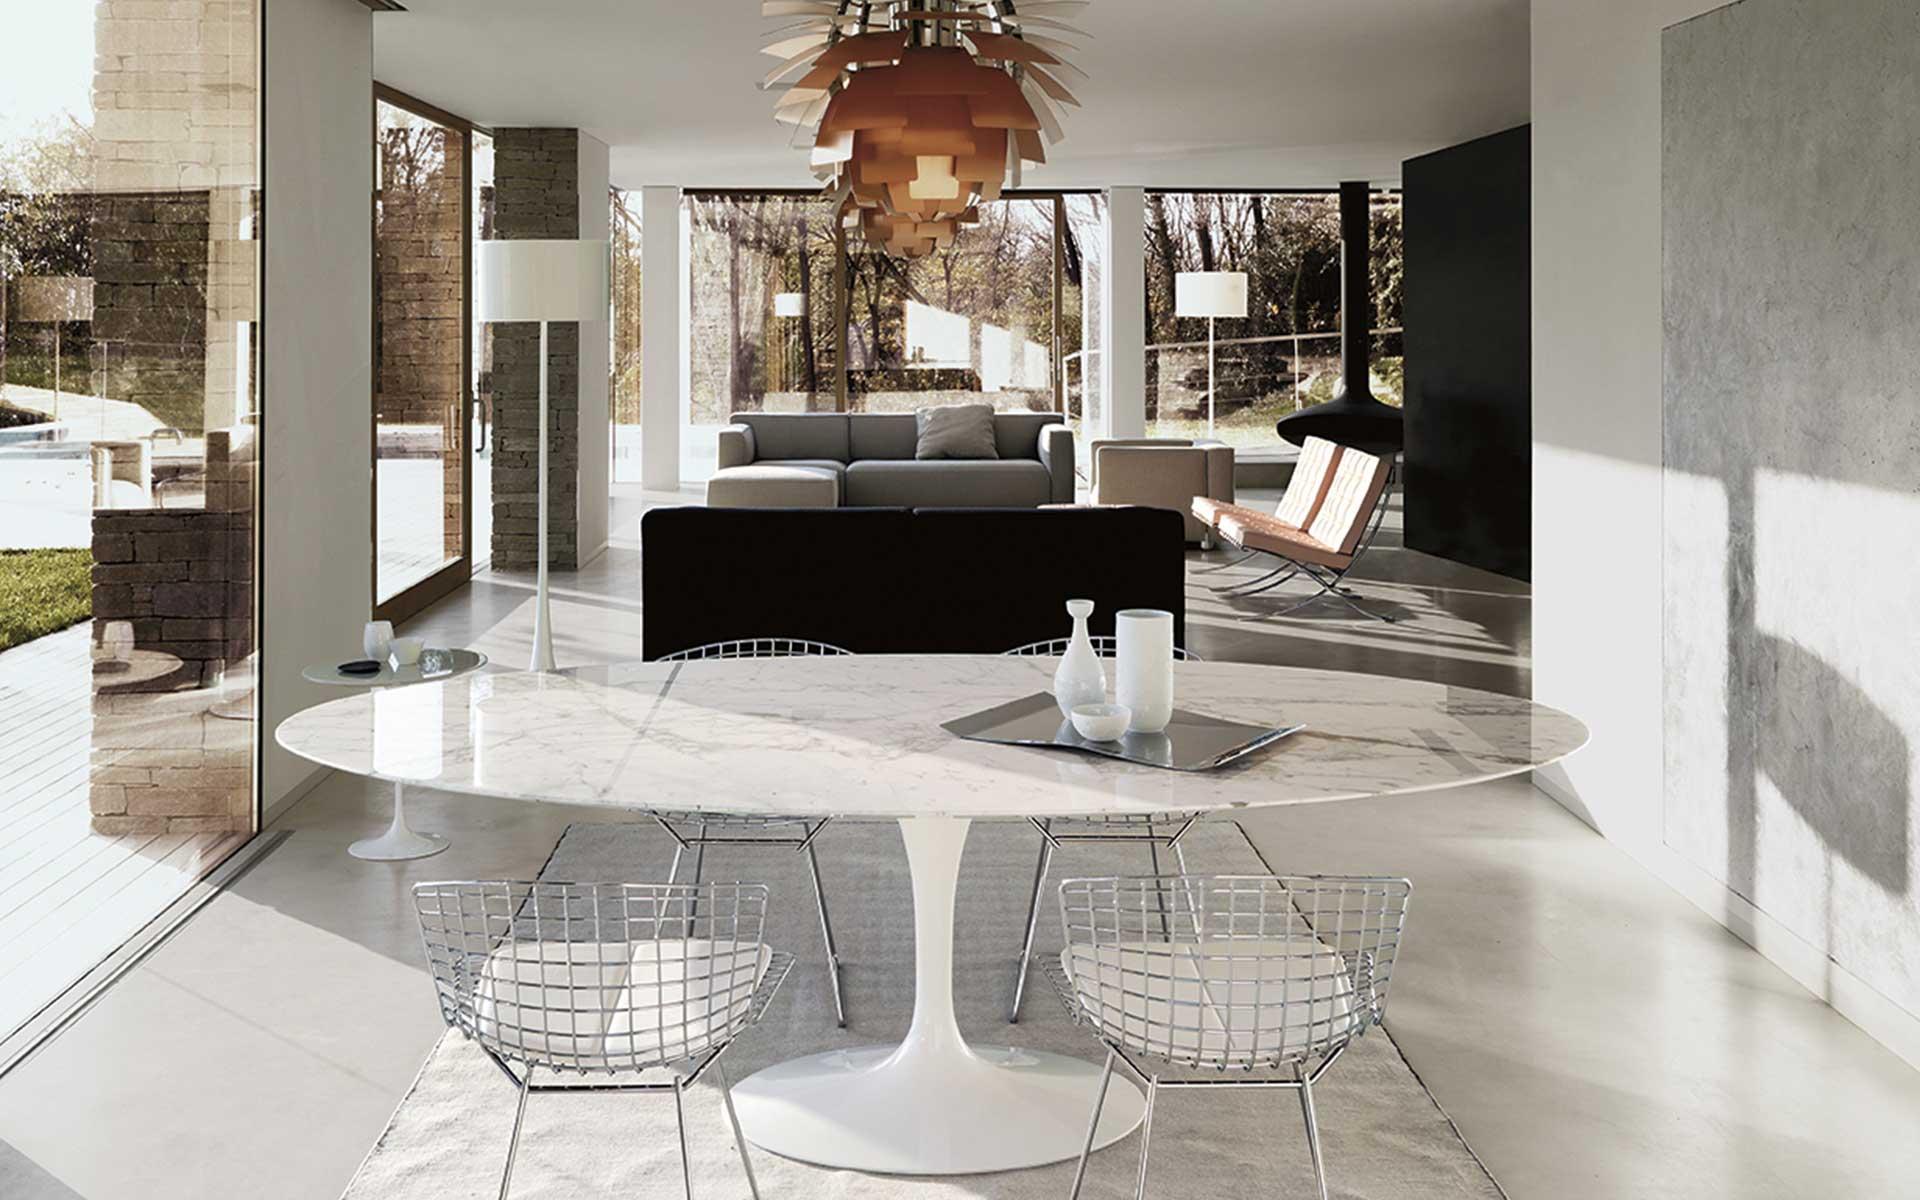 vitra mariposa sofa + repos sessel in berlin bei steidten+